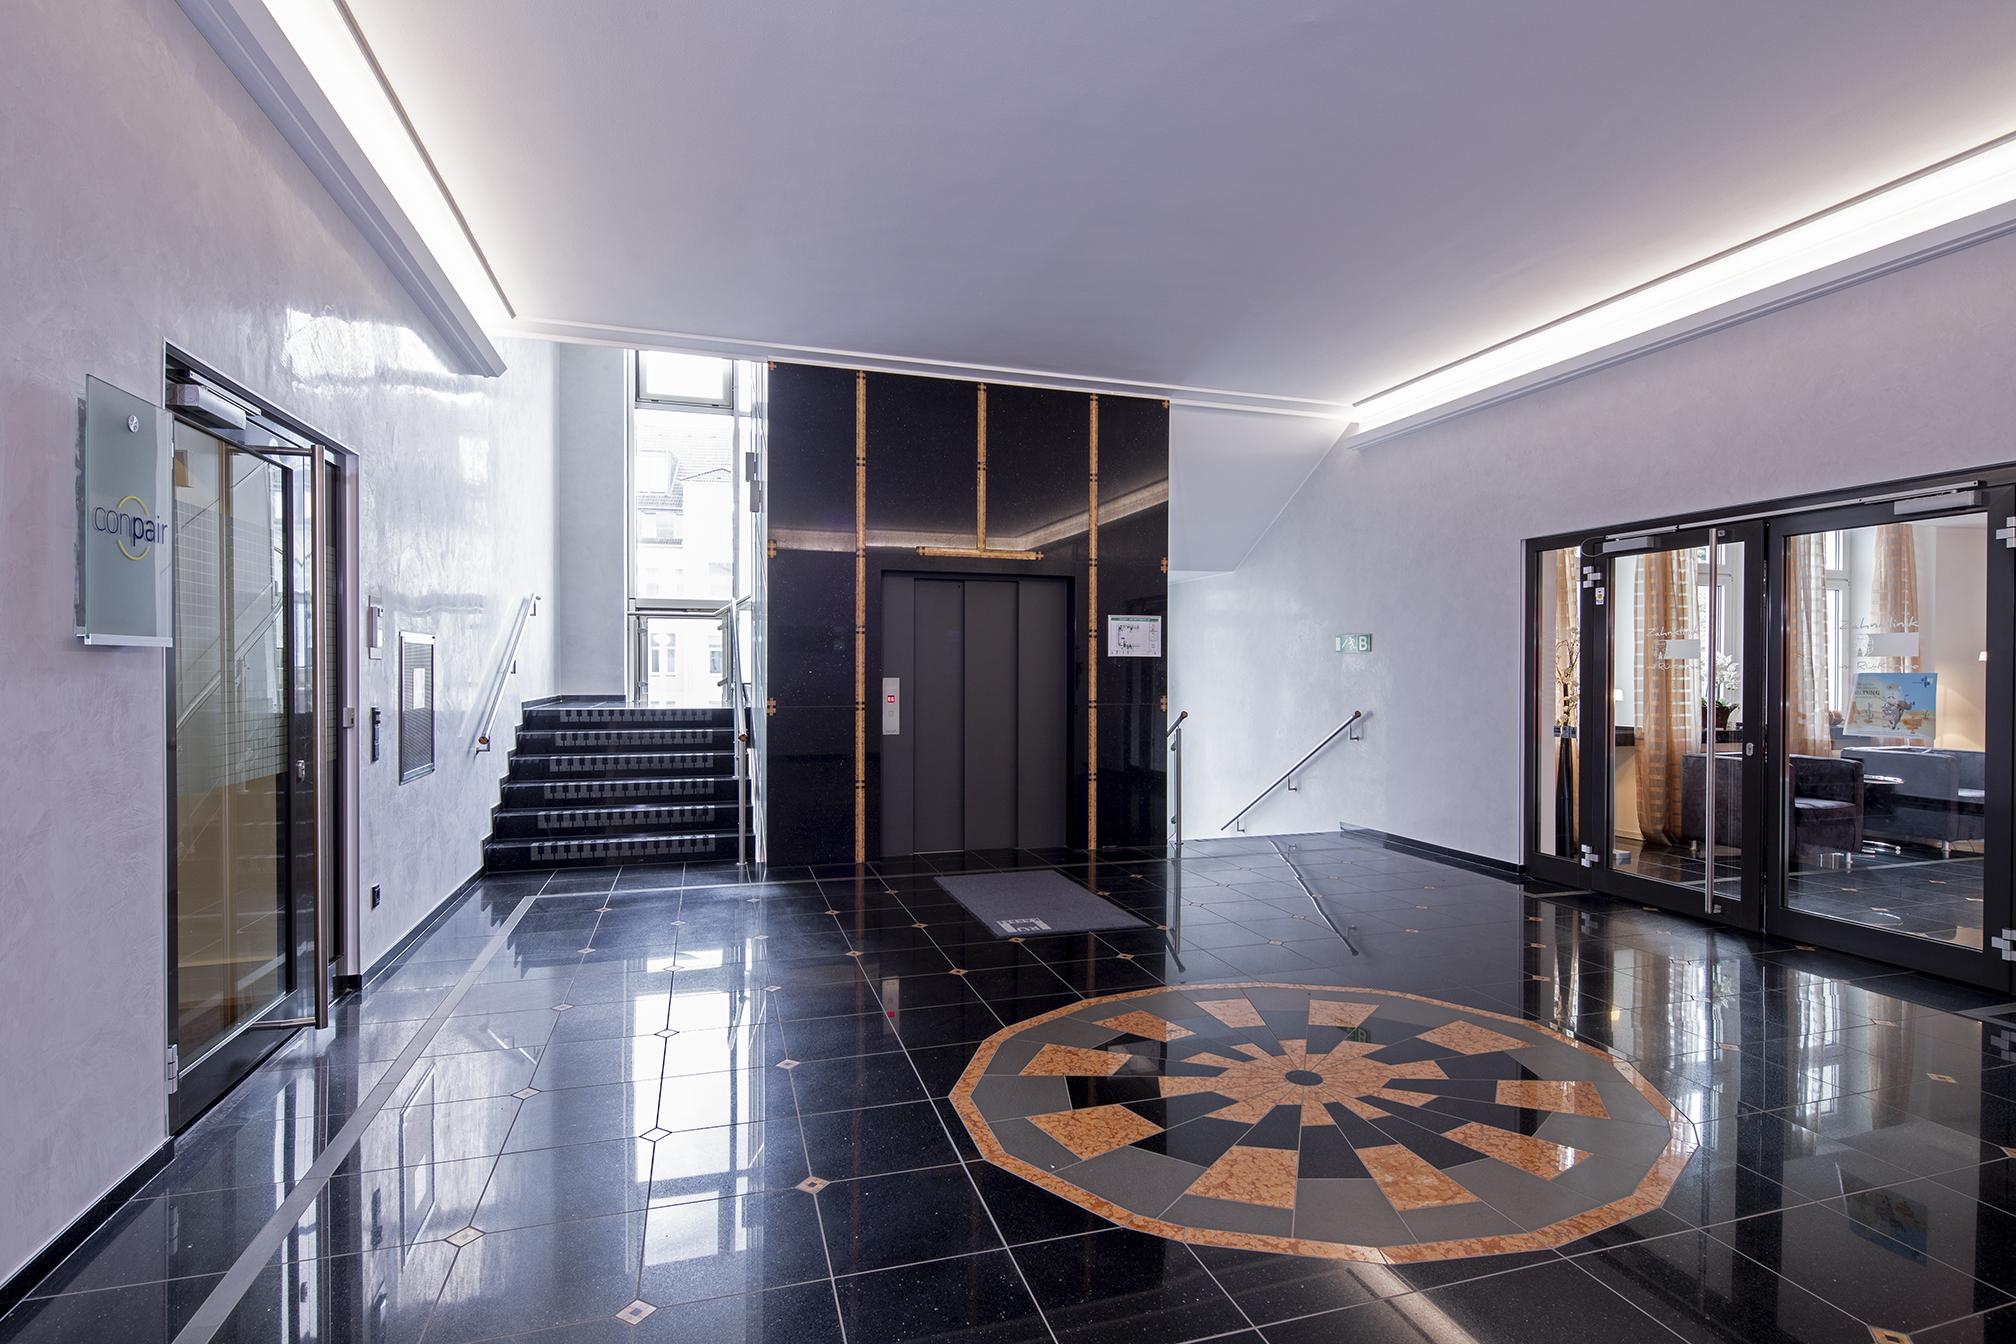 edle optik mit tiefenwirkung im essener r karree caparol farben lacke bautenschutz gmbh. Black Bedroom Furniture Sets. Home Design Ideas